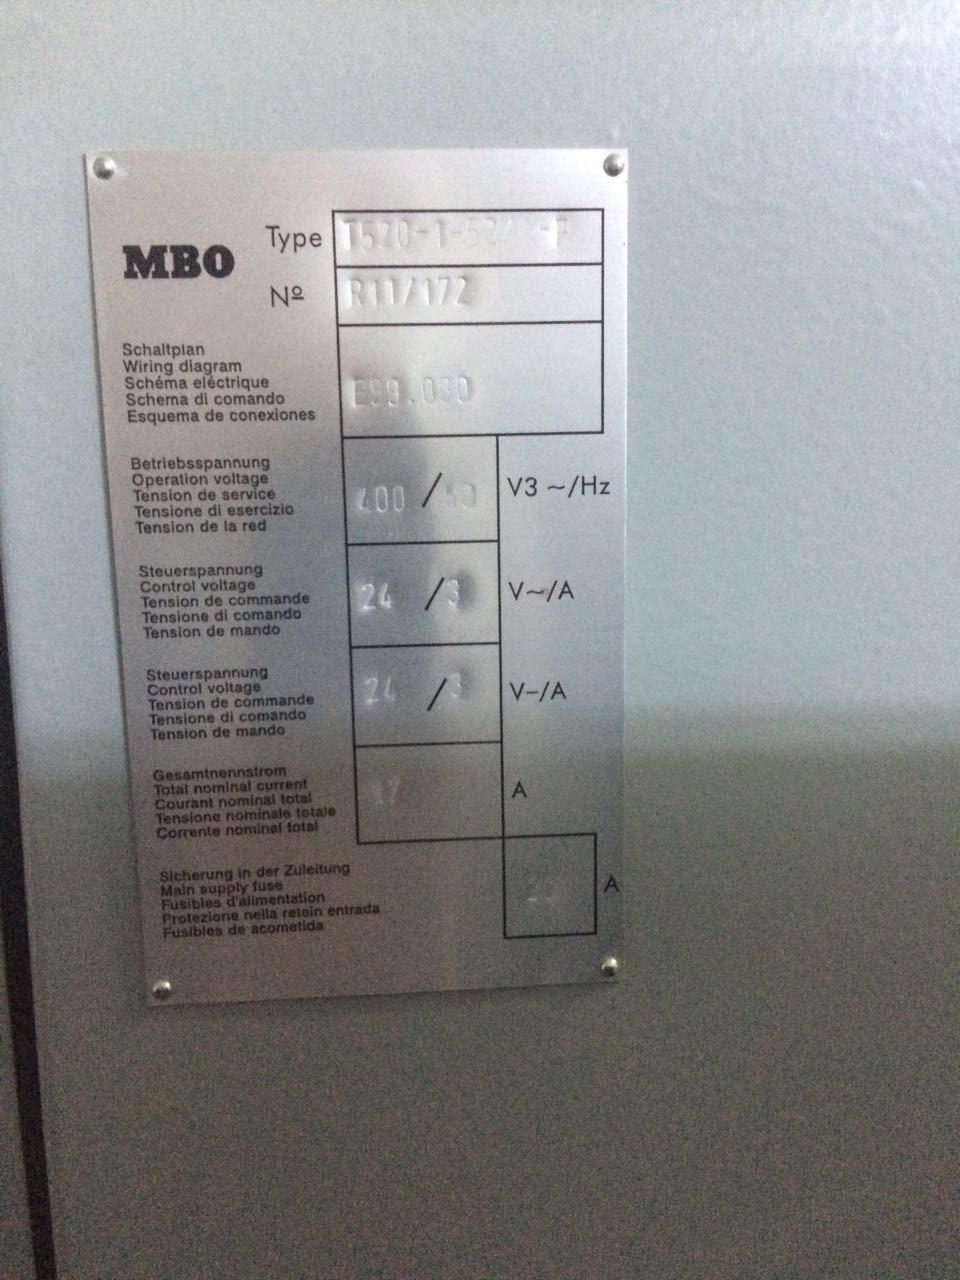 mbo folder diagram for wiring diy wiring diagrams u2022 rh socialadder co MBO Folder Parts Manual Baum Folder Registration